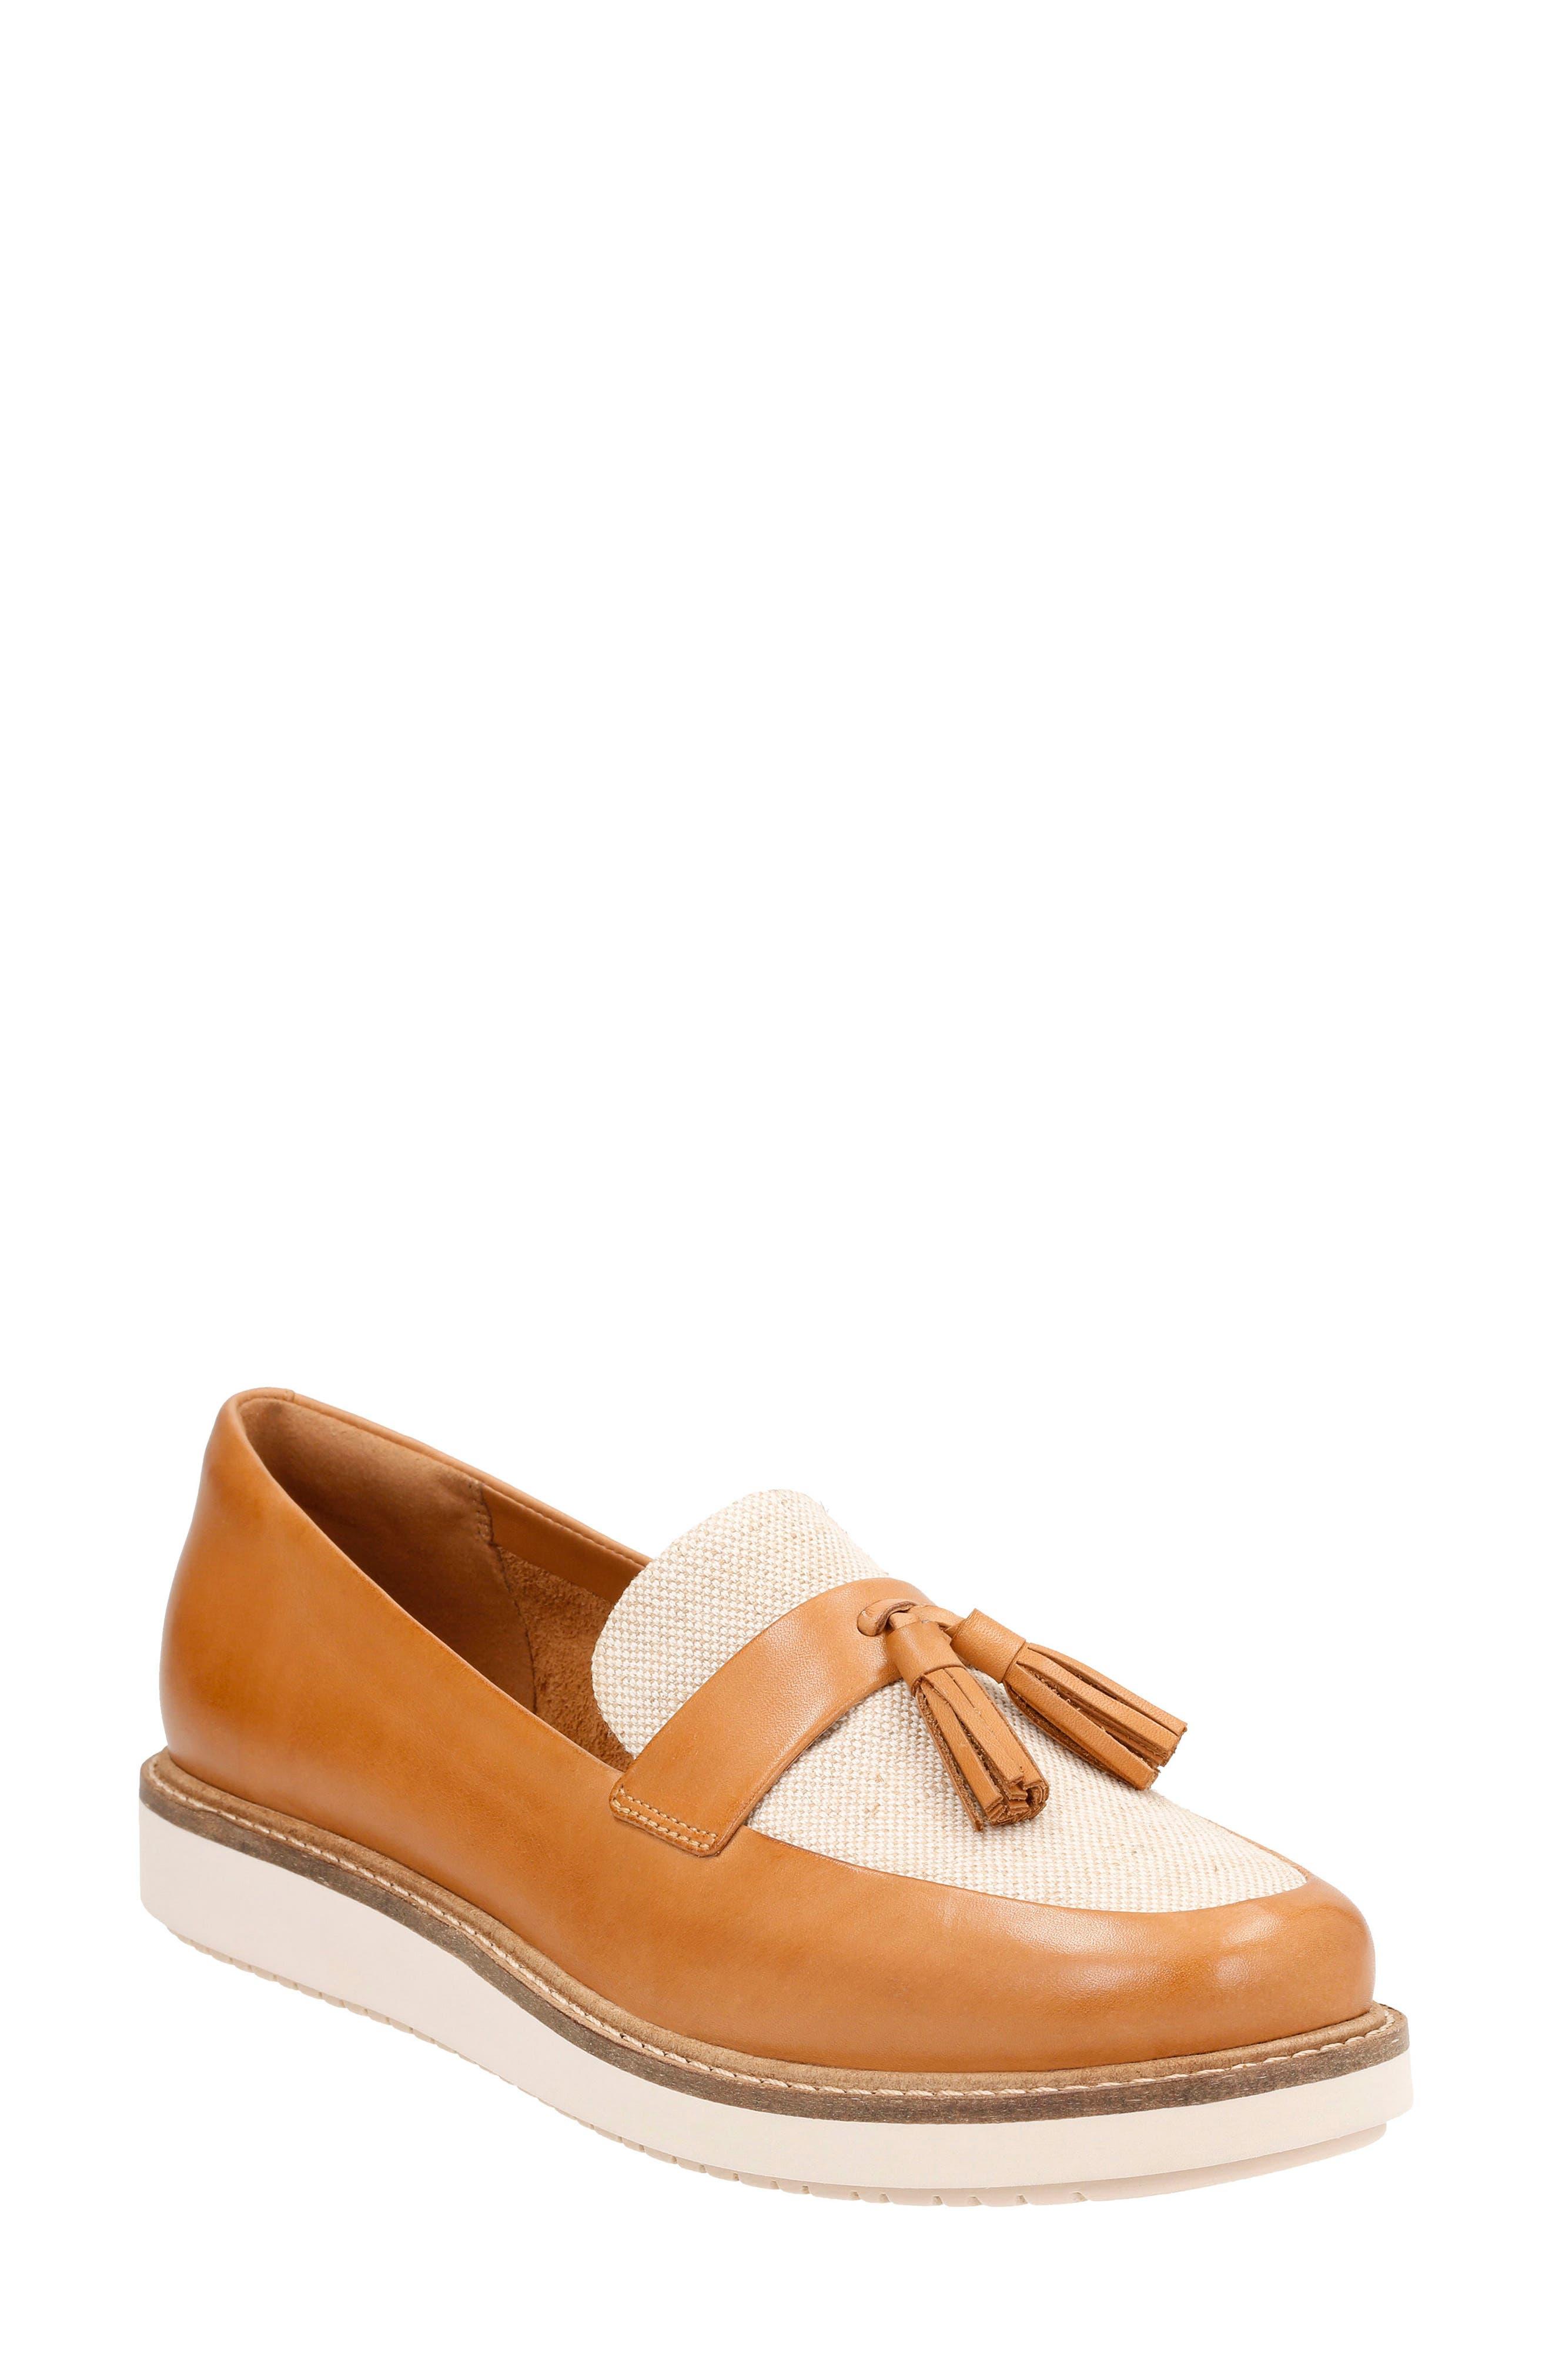 Glick Castine Tassel Loafer,                         Main,                         color, Light Tan Leather